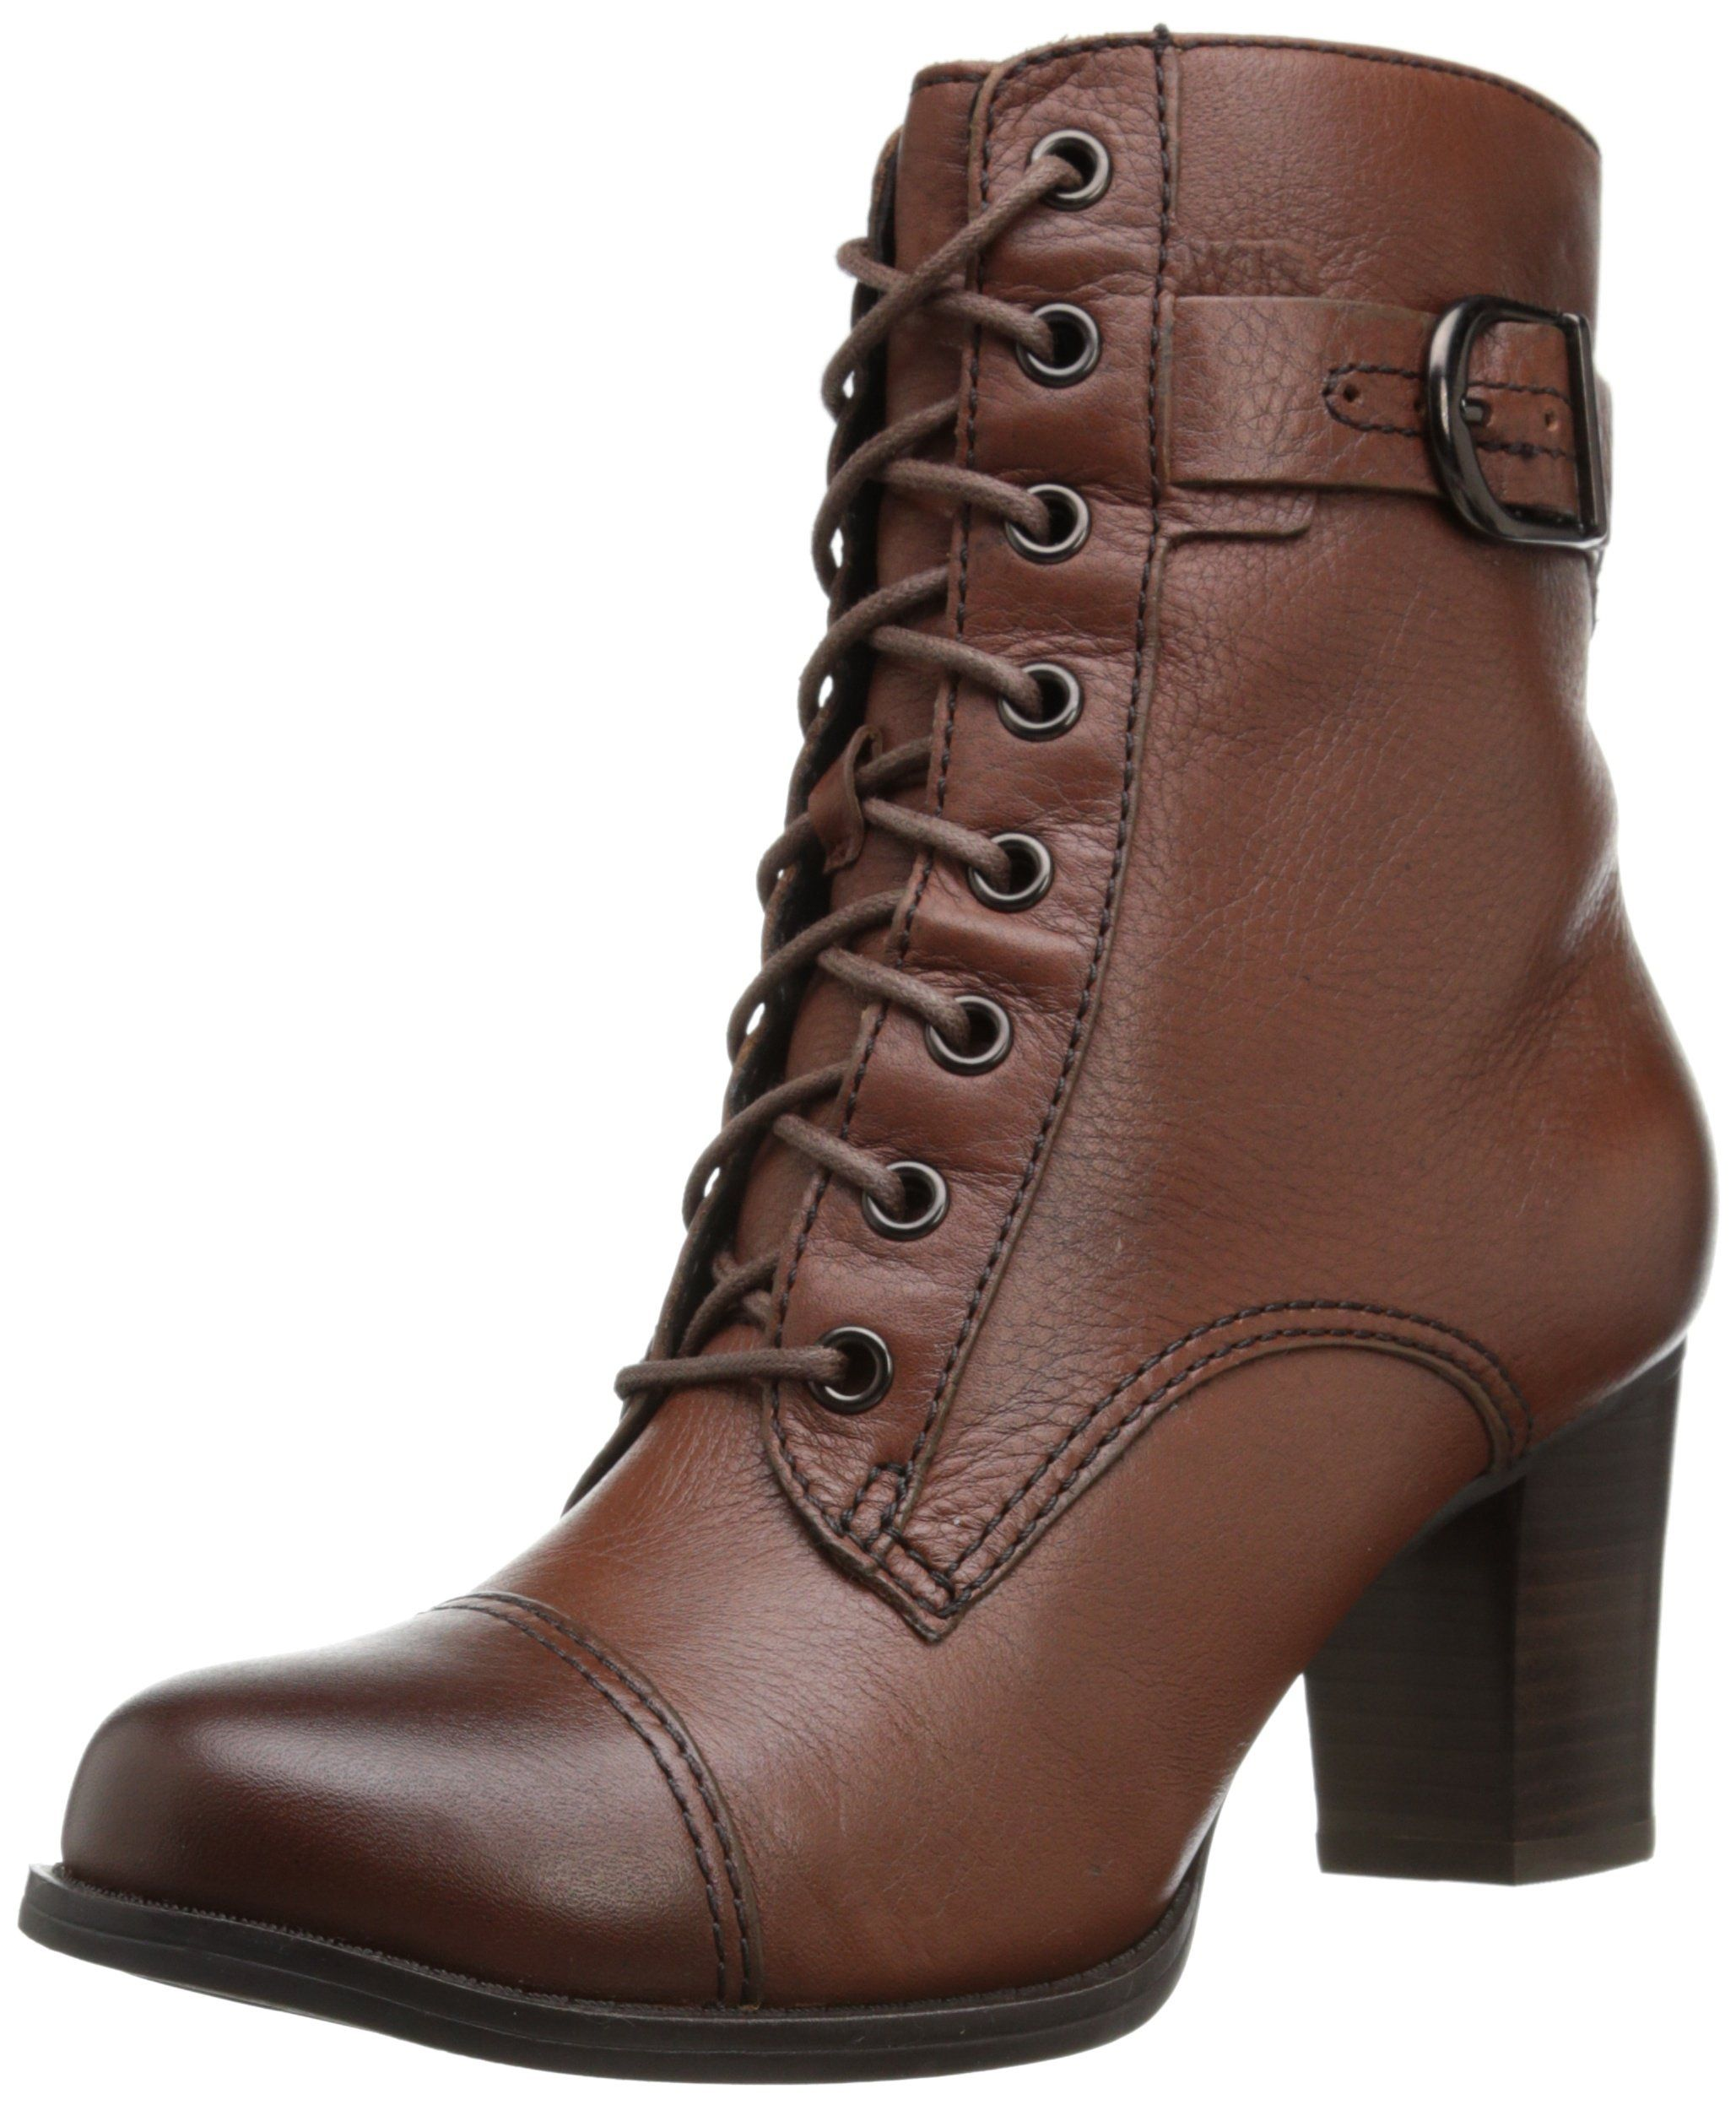 : Clarks Women's Jolissa Gypsum Boot: Black